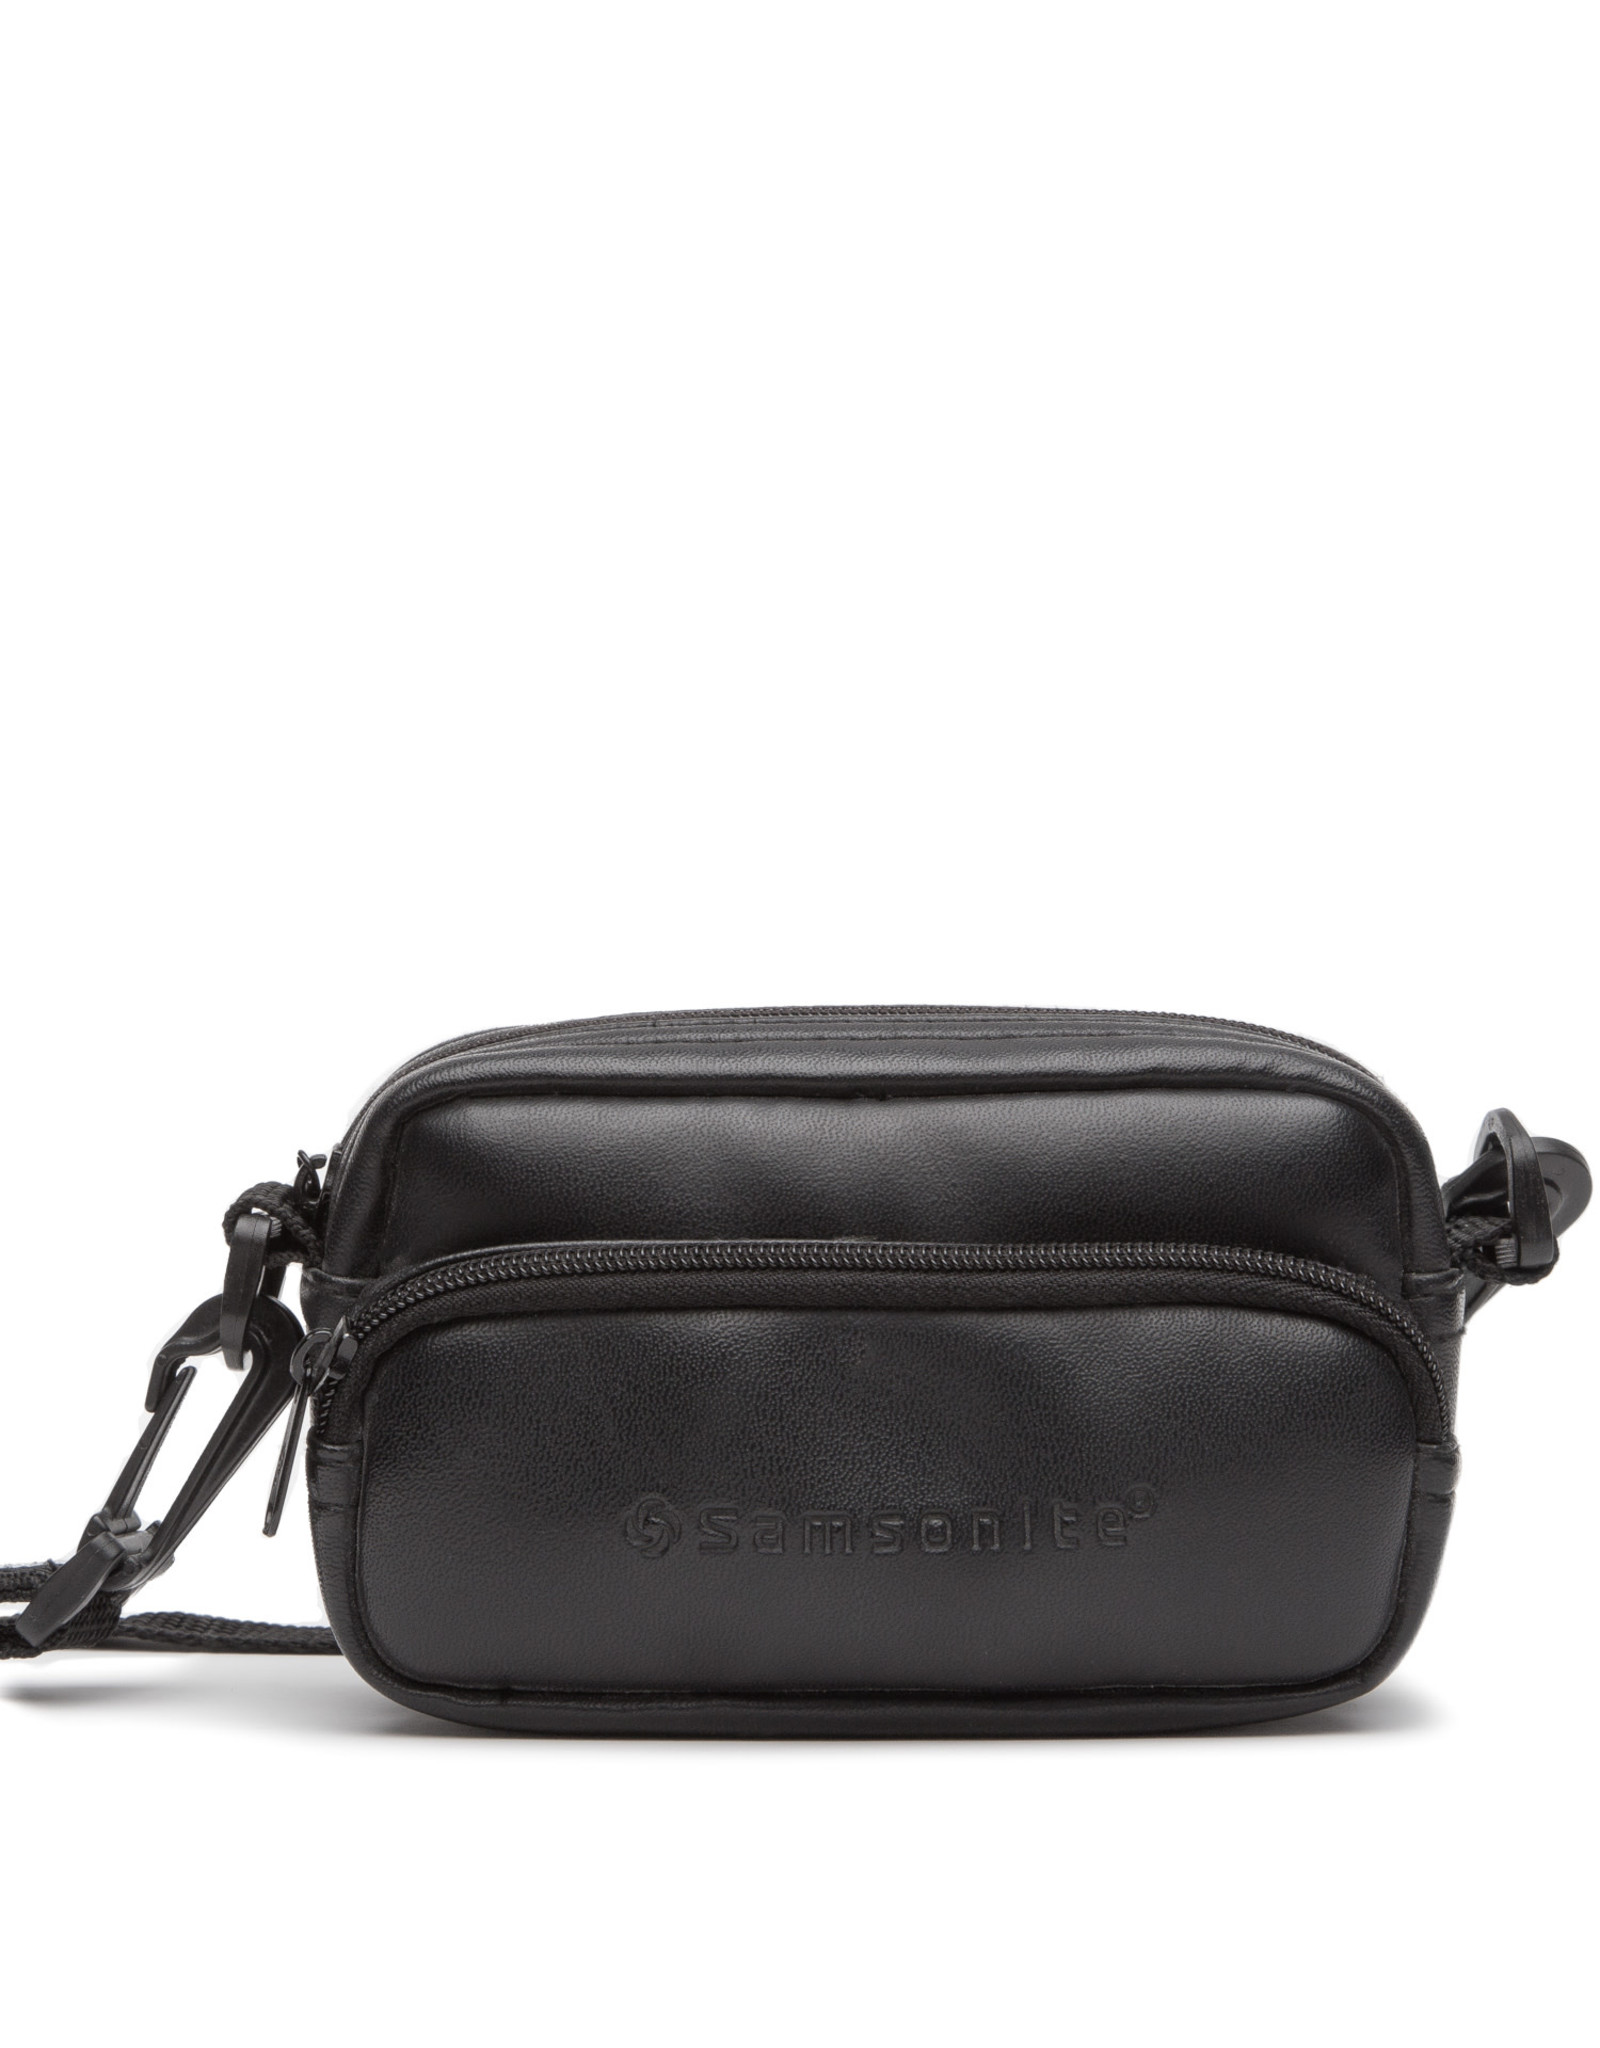 Samsonite Vintage Samsonite Black Camera Bag